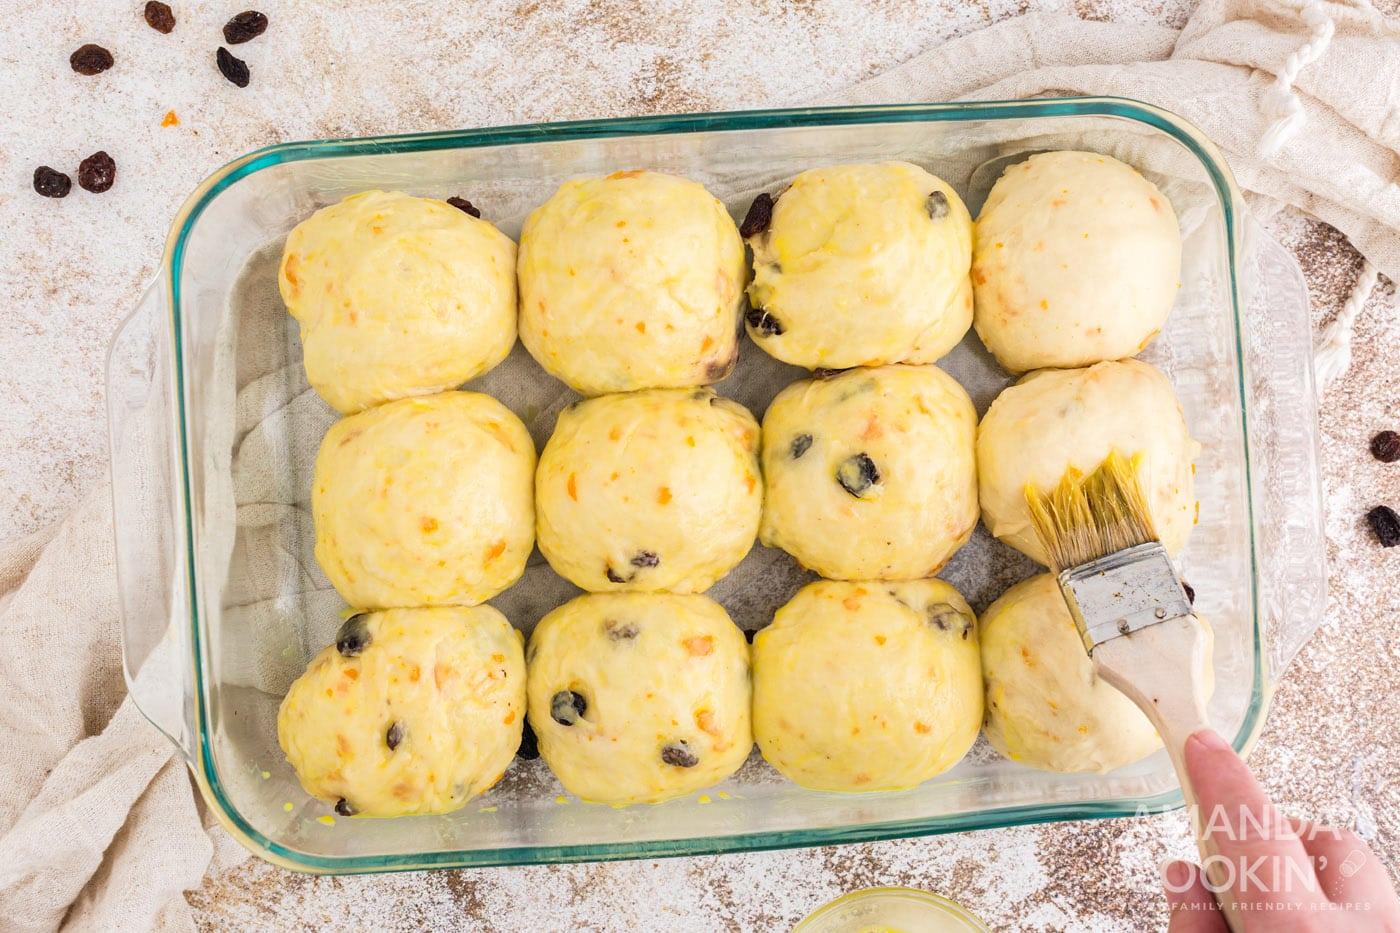 brushing tops of dough balls with eggwash